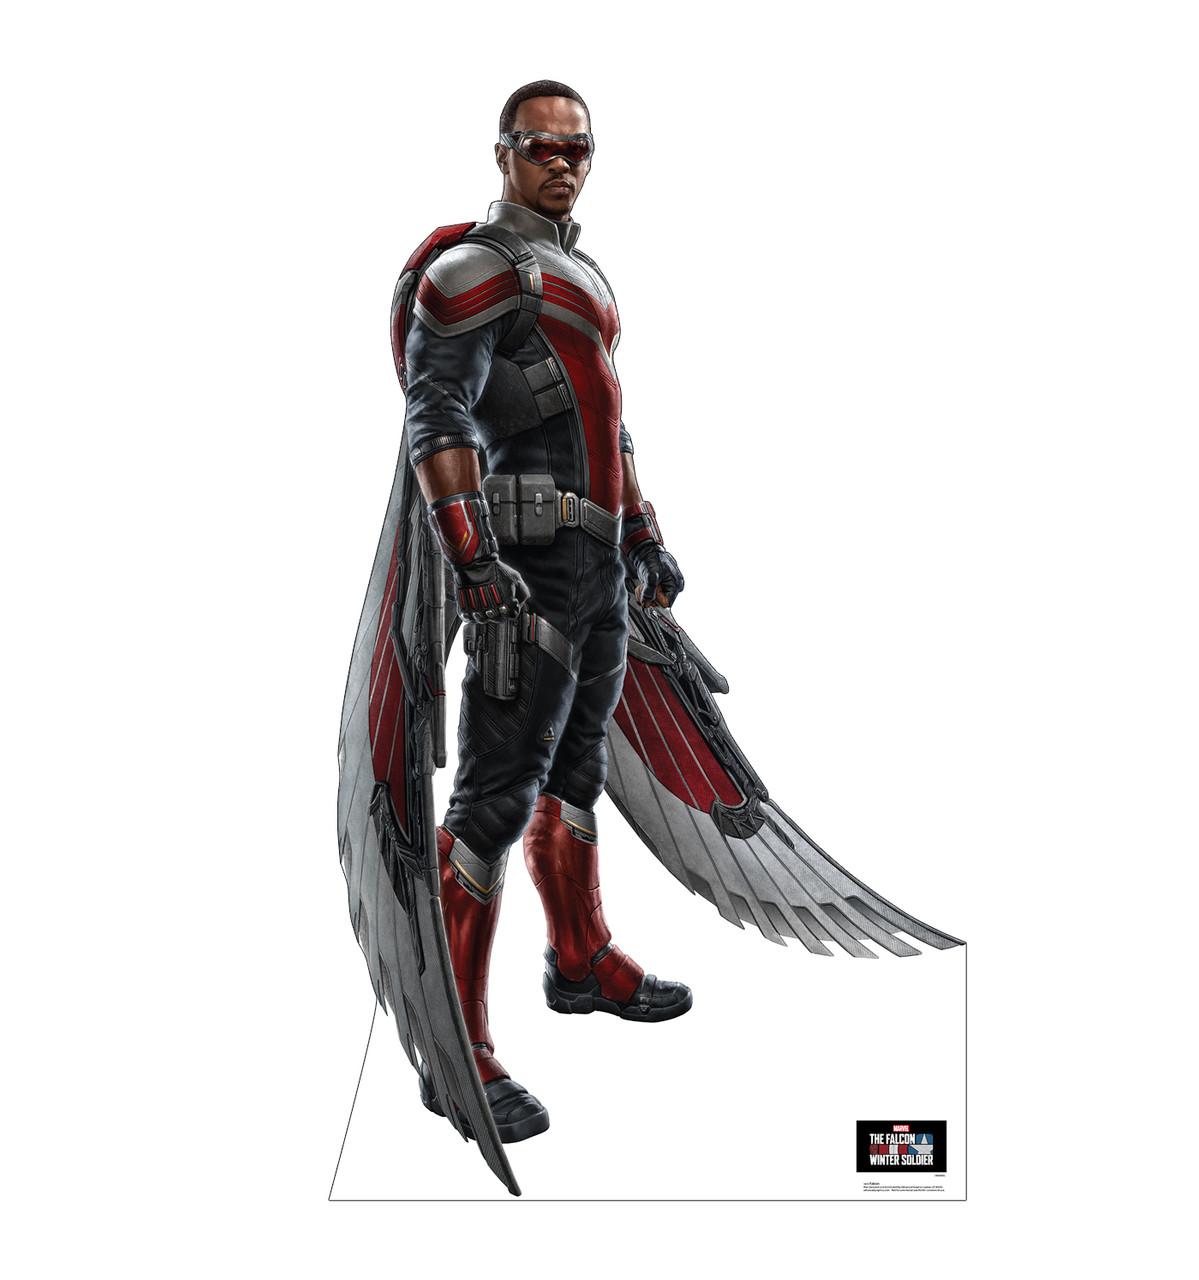 Life-size cardboard standee of Falcon.